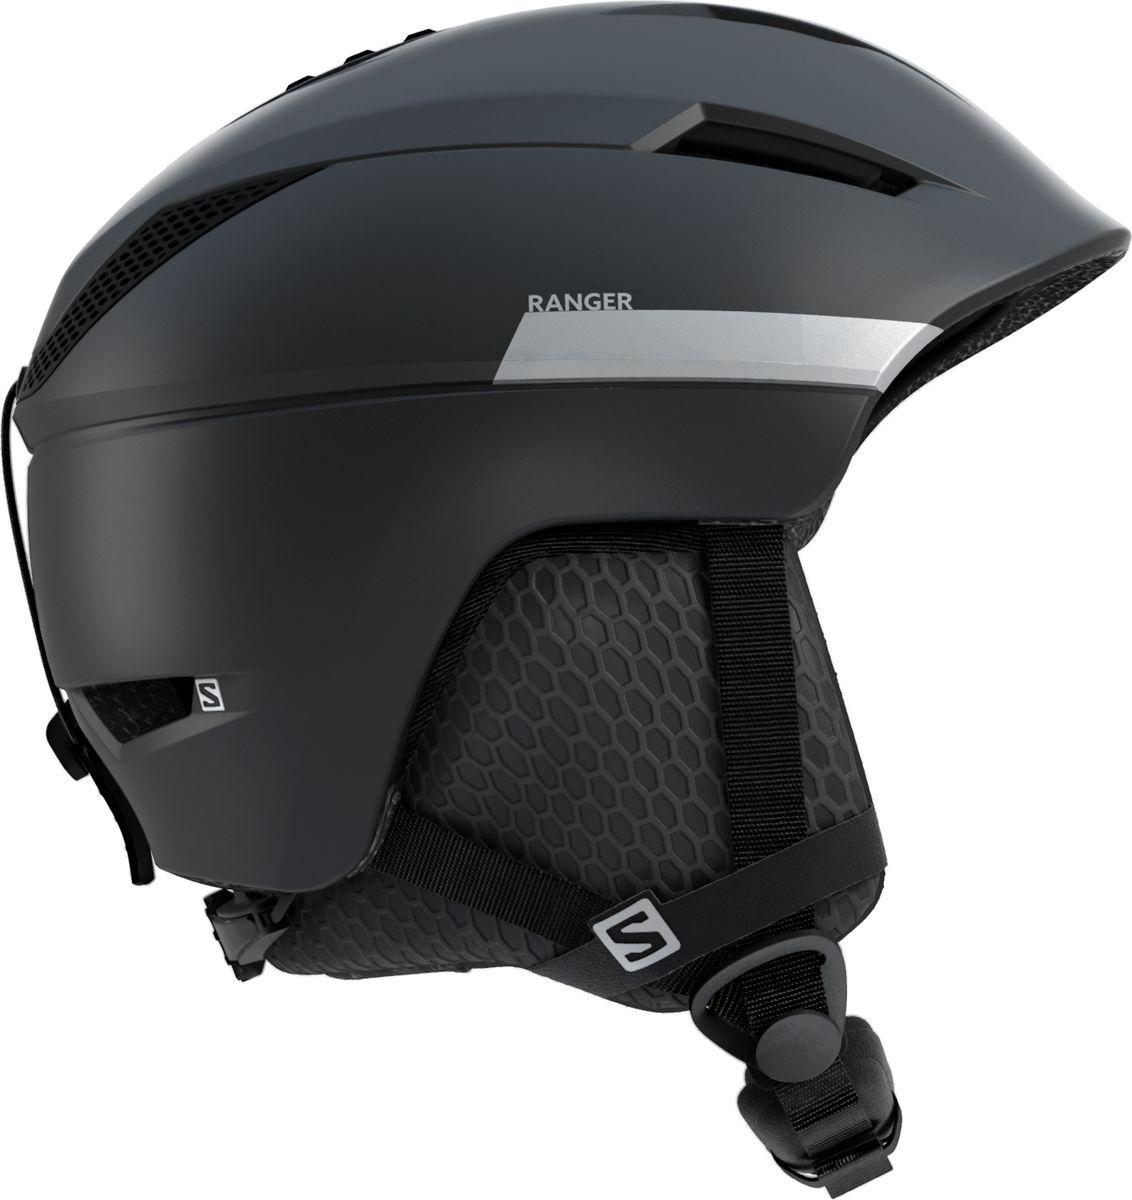 Шлем горнолыжный Salomon Ranger2 Mips, цвет: черный. Размер M (56-59)